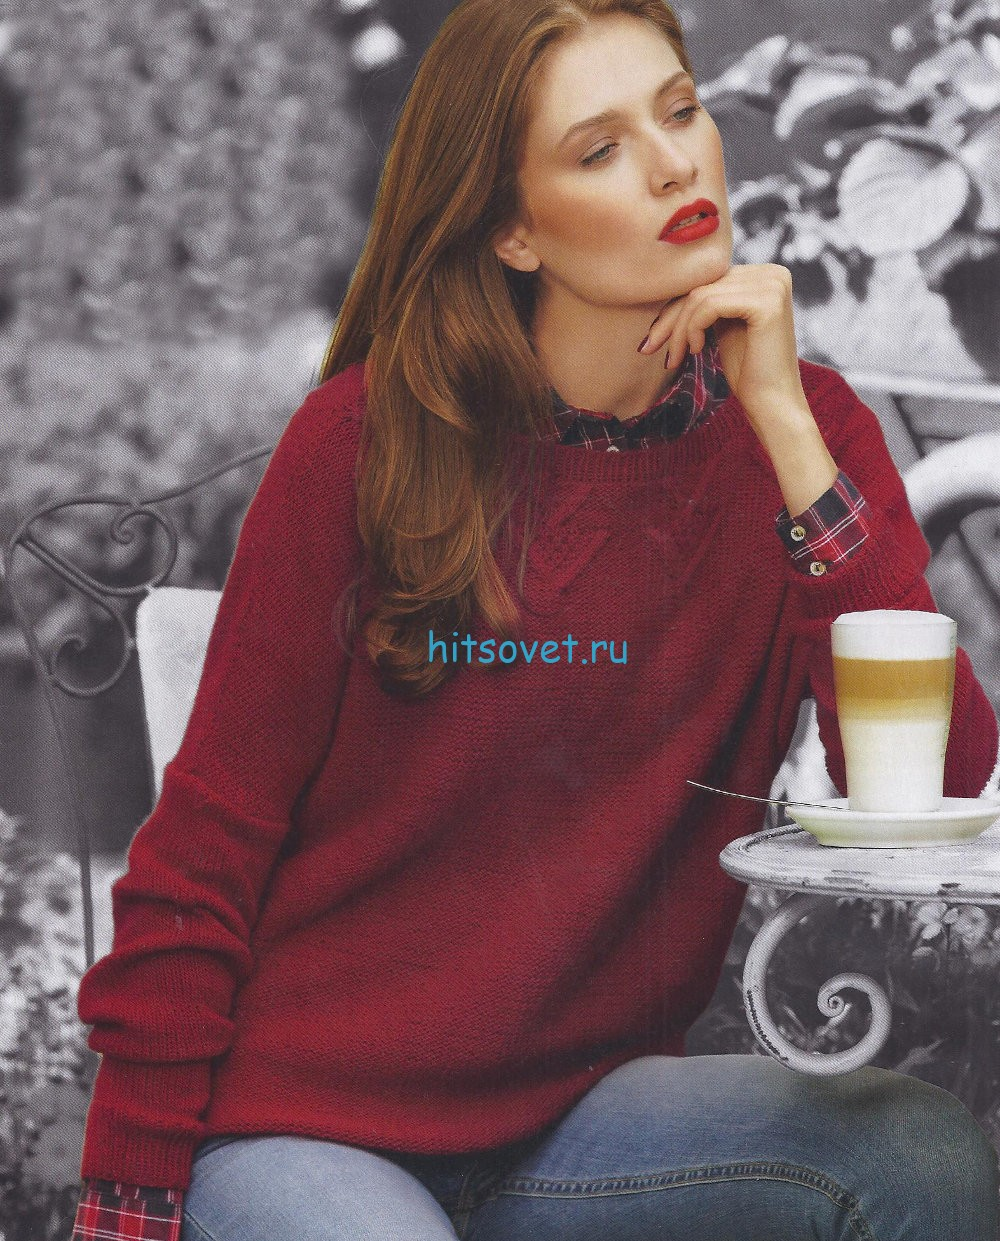 Вязание пуловера с мотивом клубника